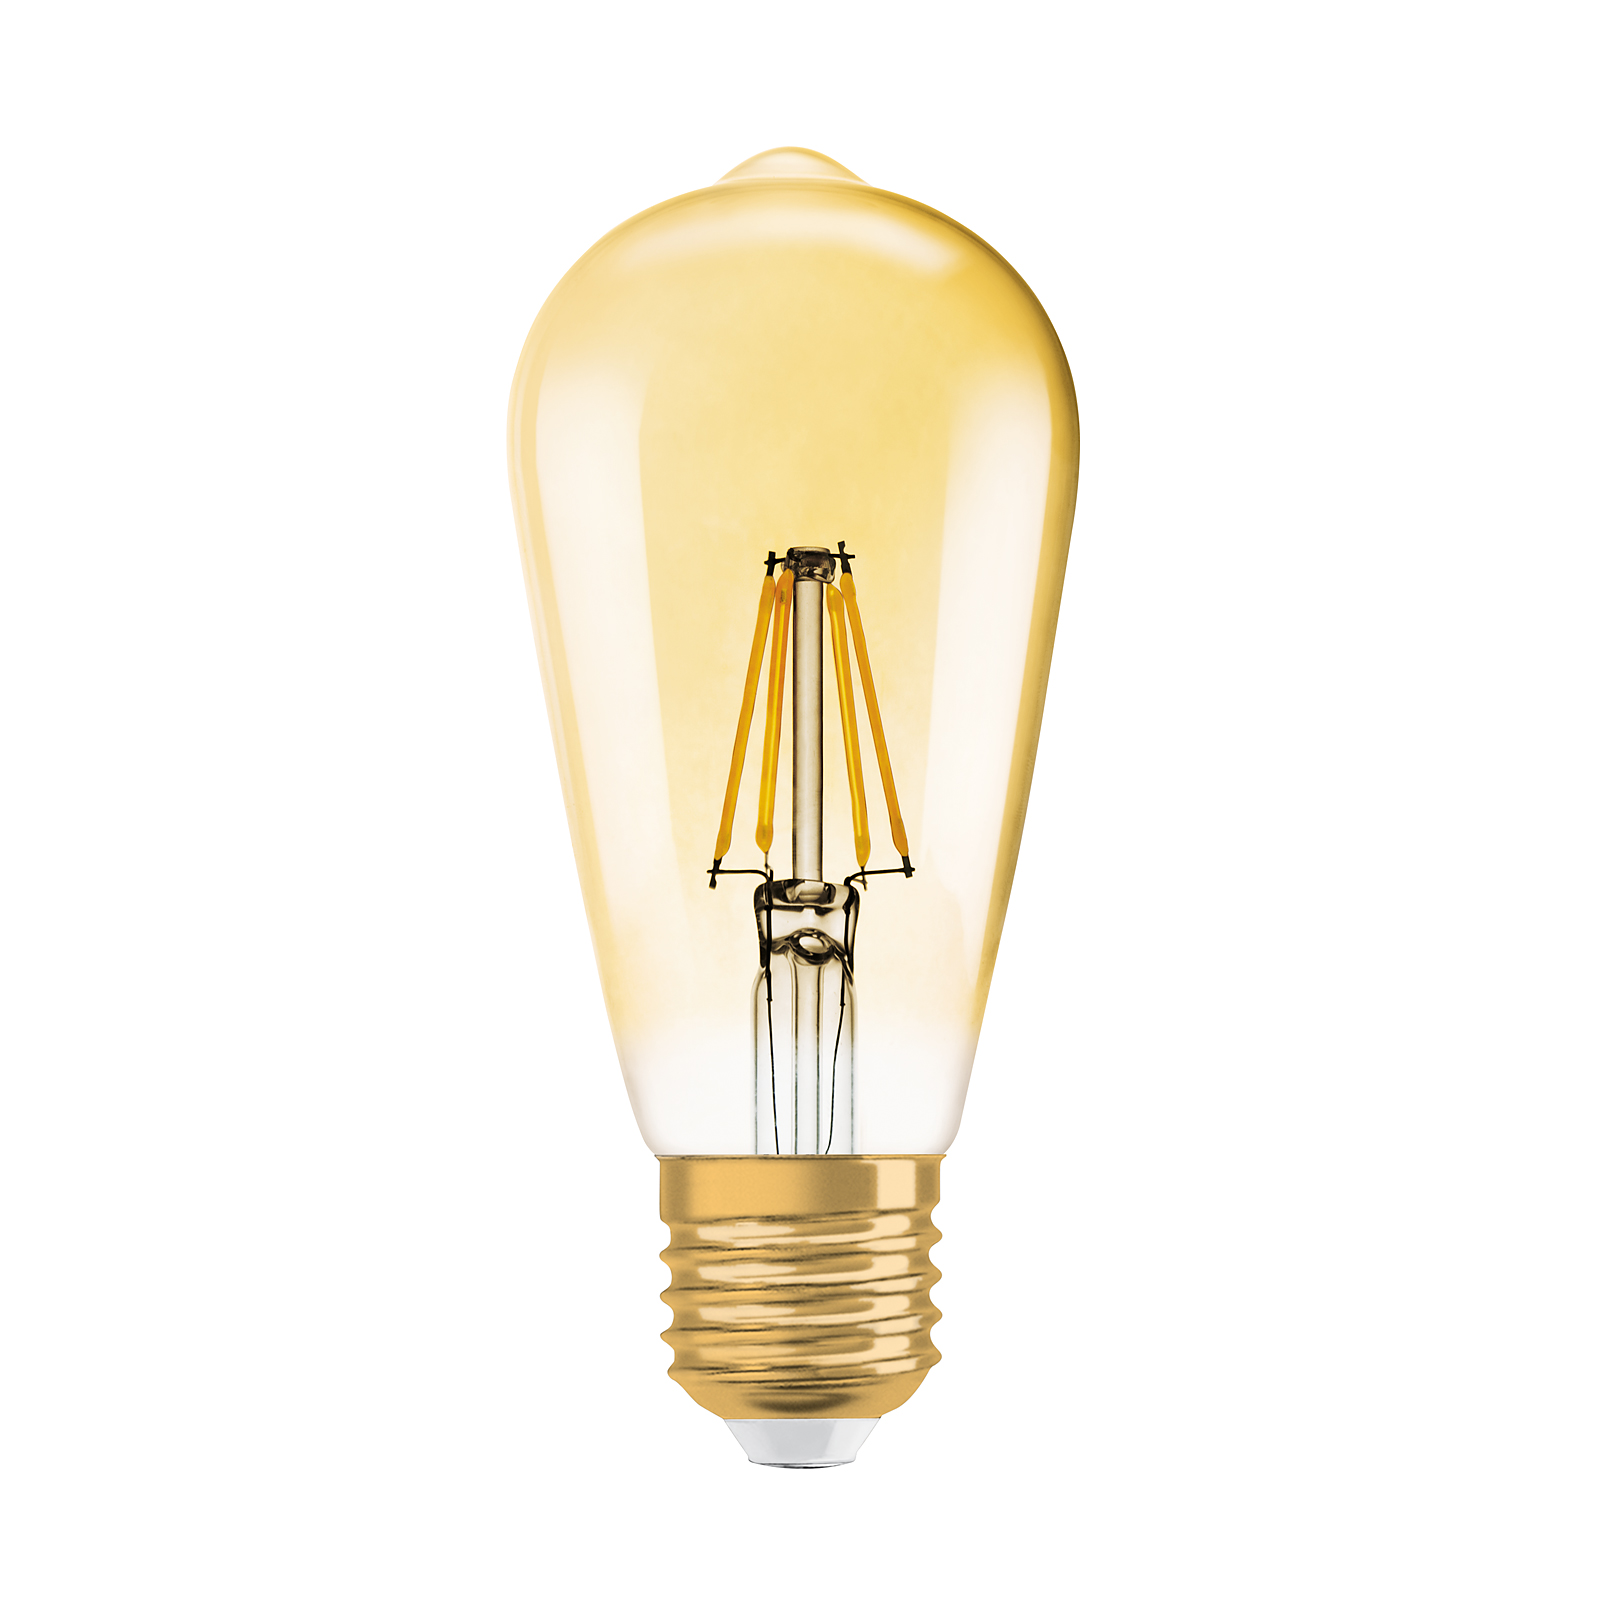 osram vintage edition 1906 led st35 e27 4w wie 35 watt 470 lumen 2400 kelvin. Black Bedroom Furniture Sets. Home Design Ideas